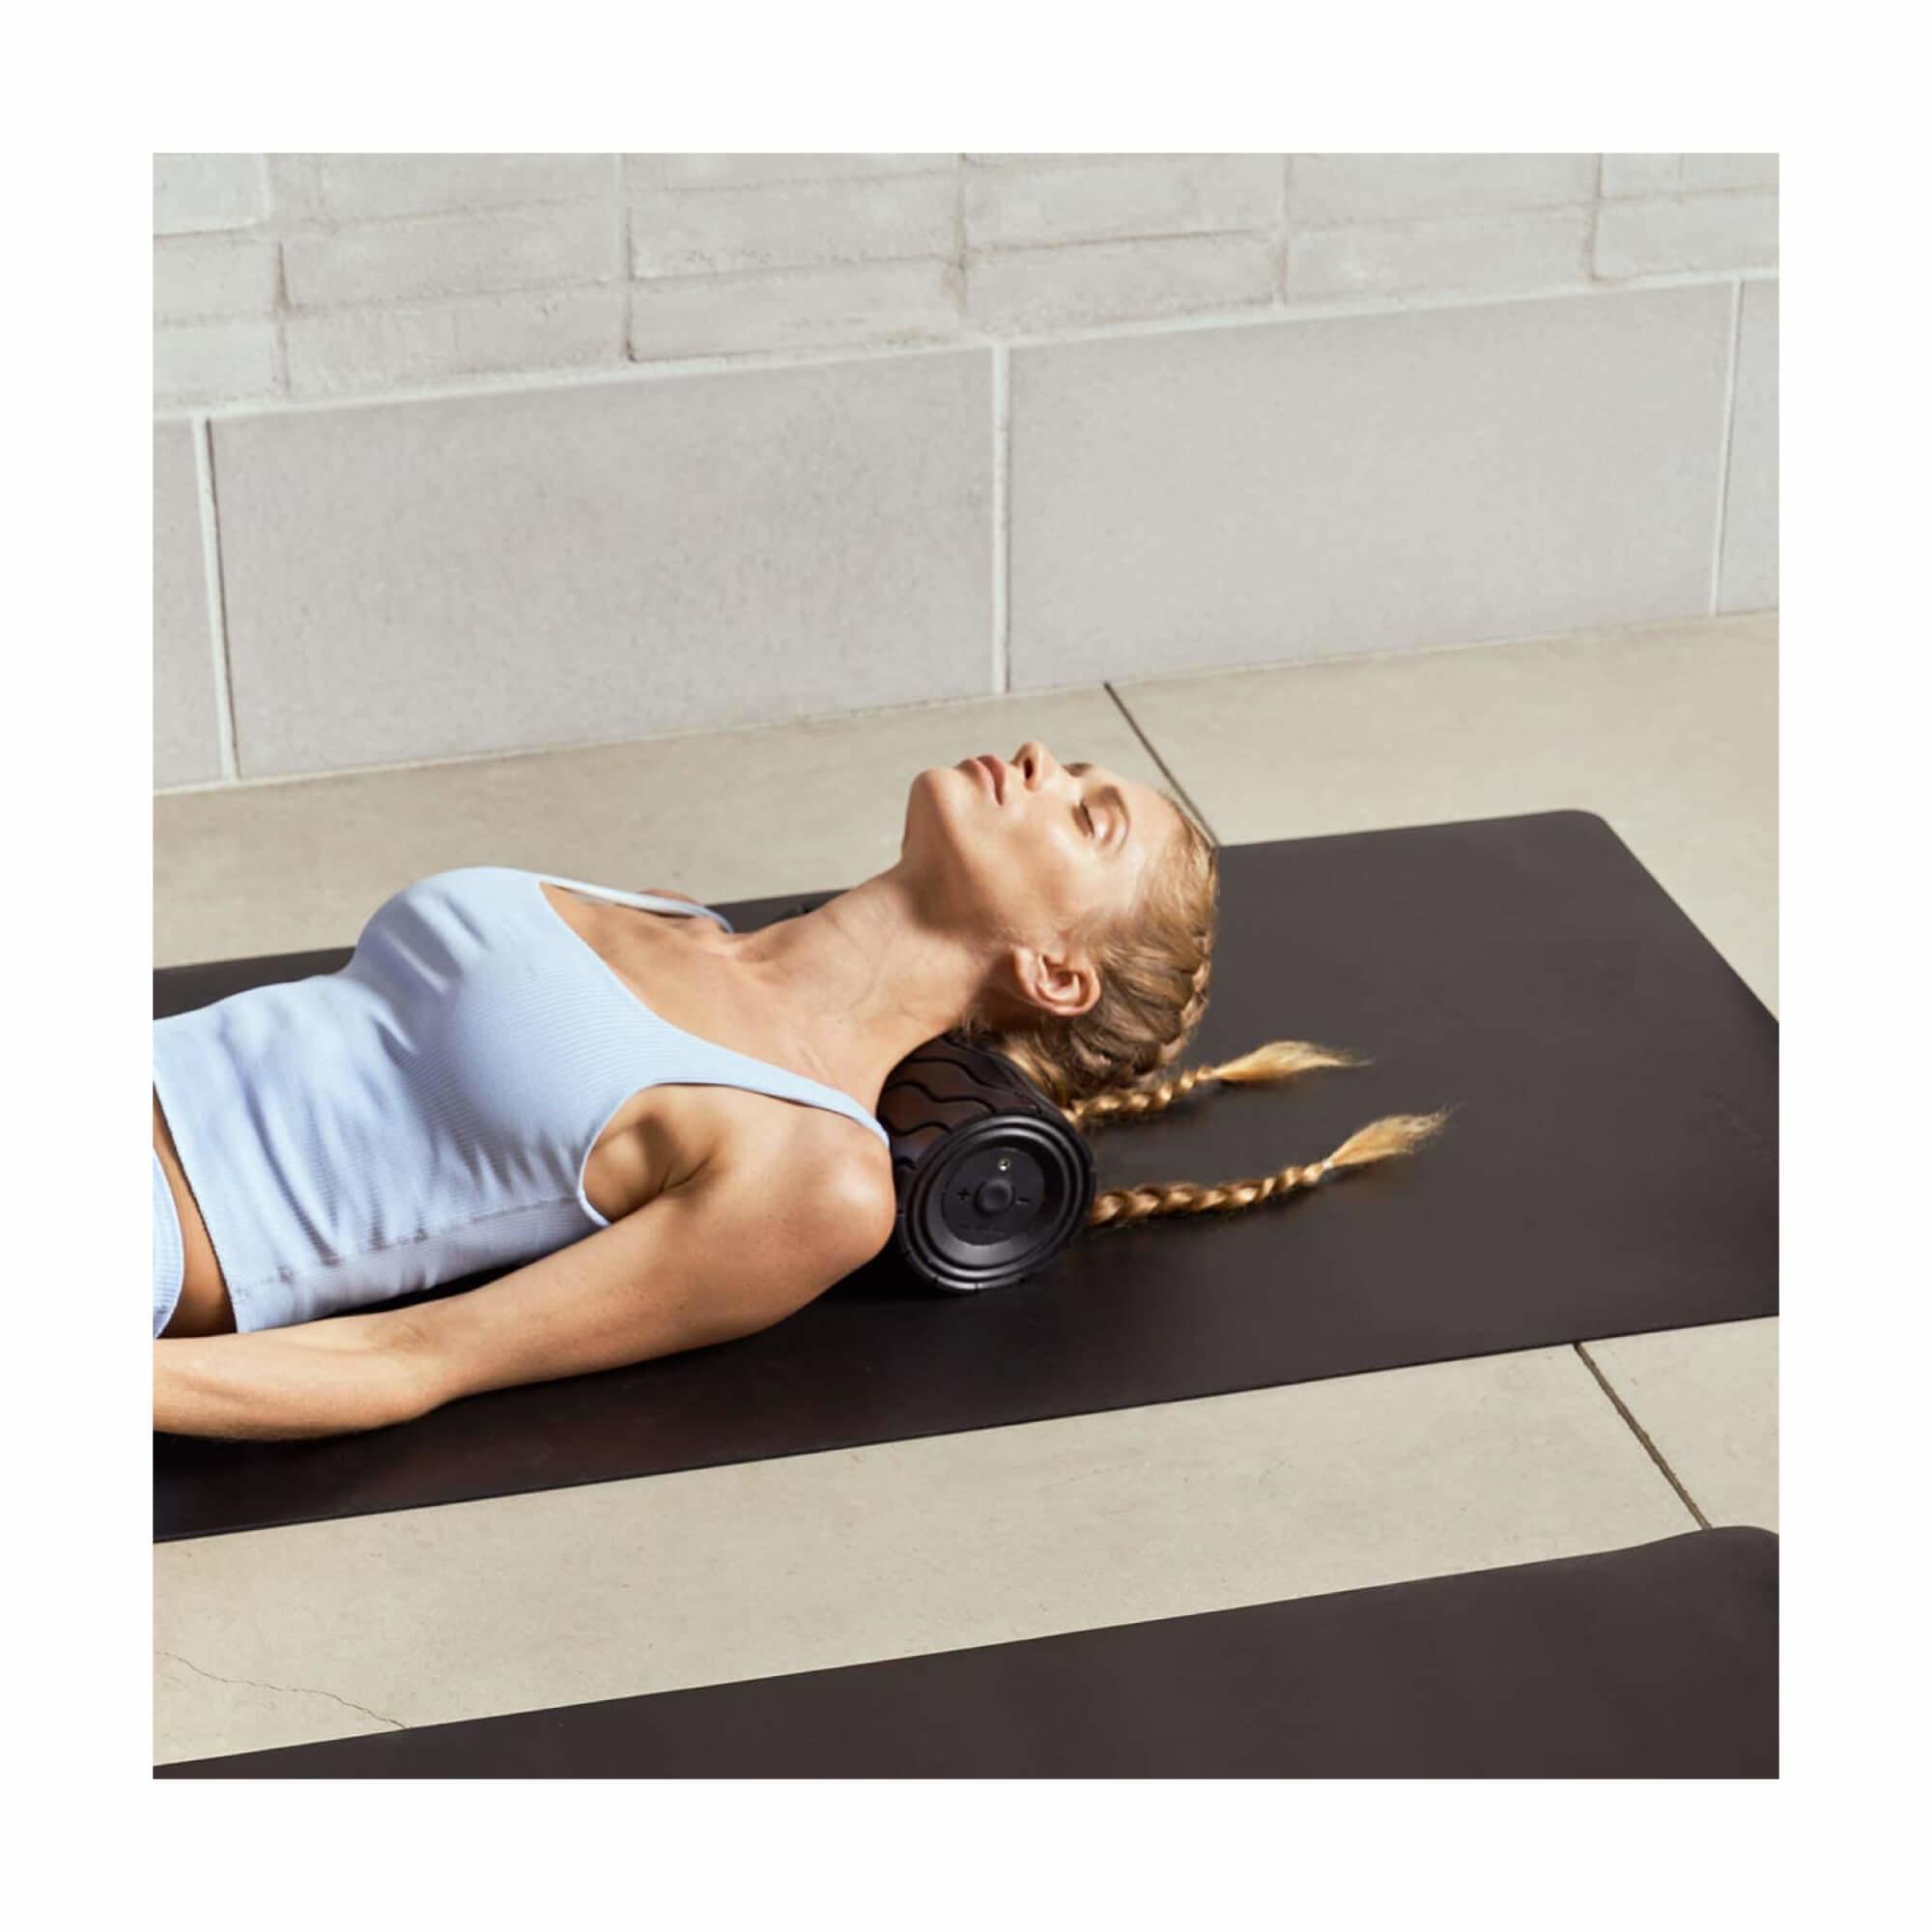 Wave Roller Massage Device-6